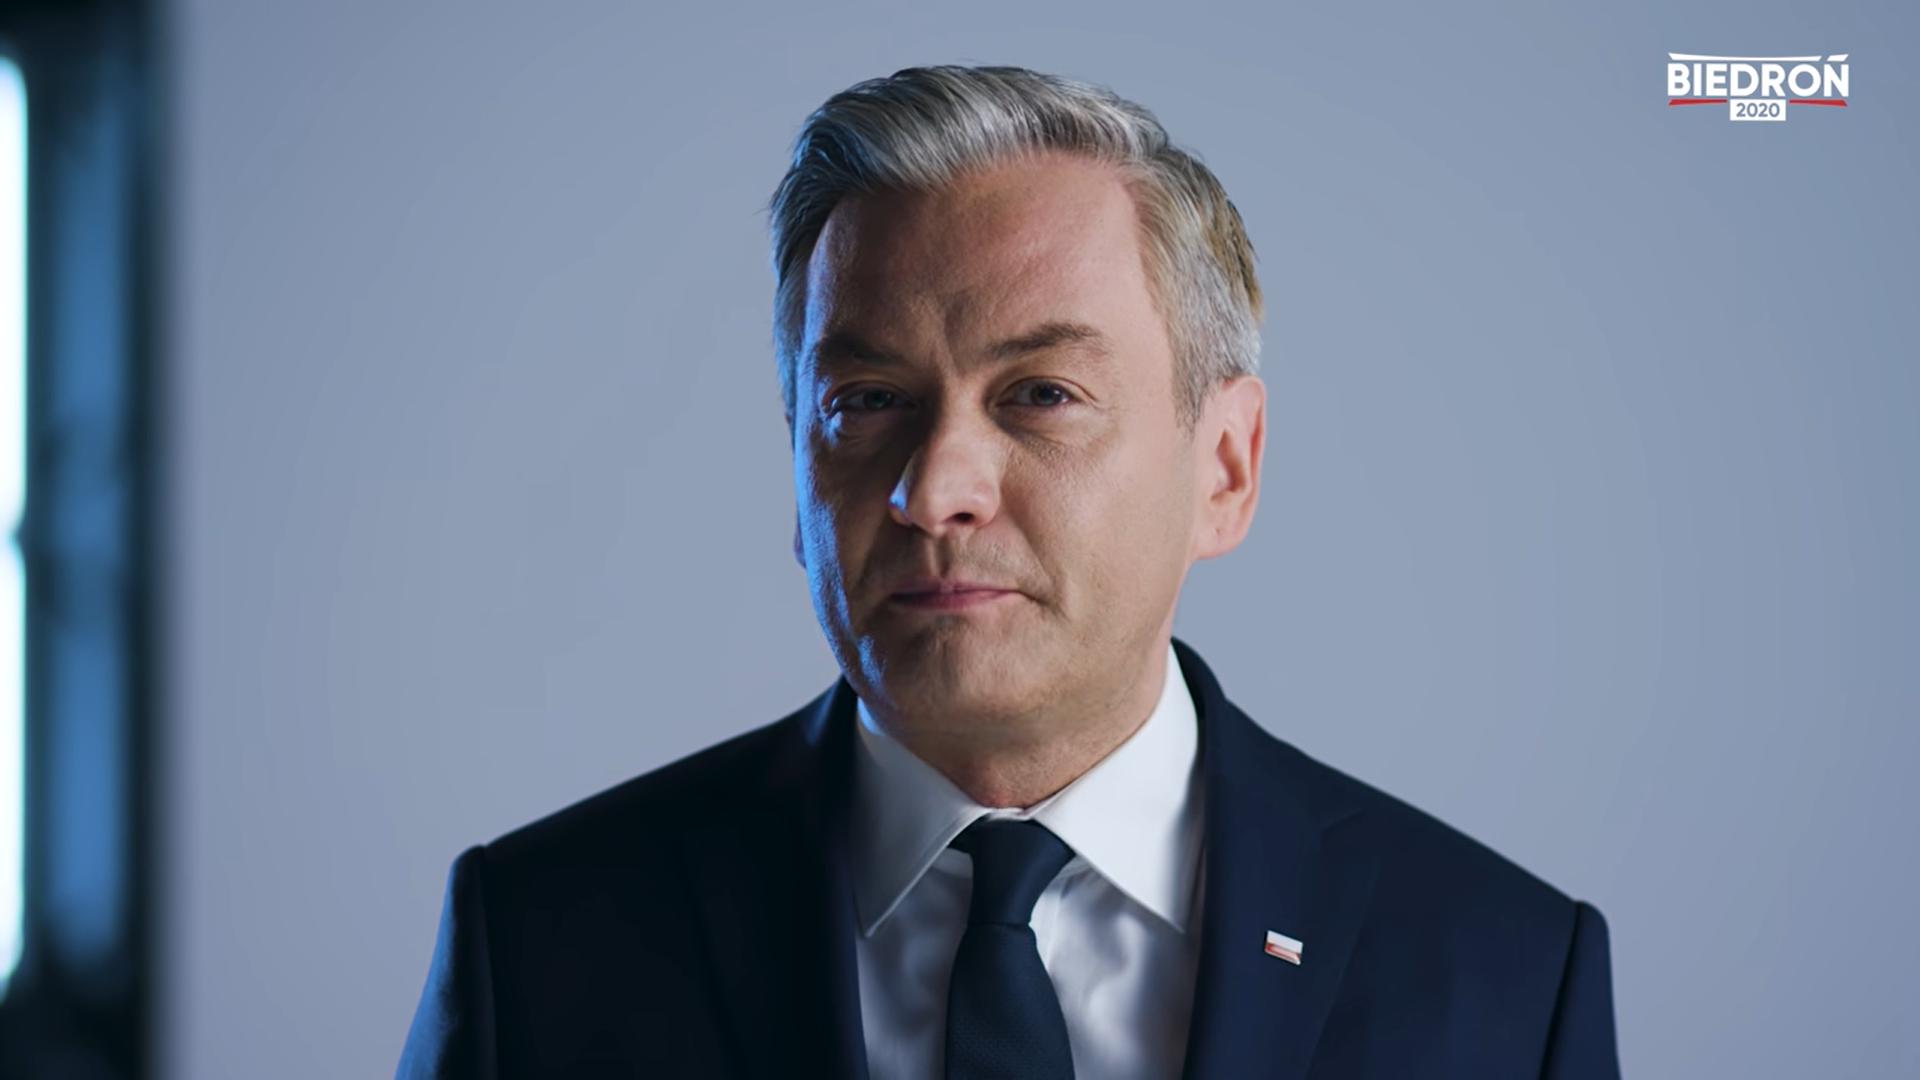 Wybory Prezydenta RP - sylwetki kandydatów: Robert Biedroń